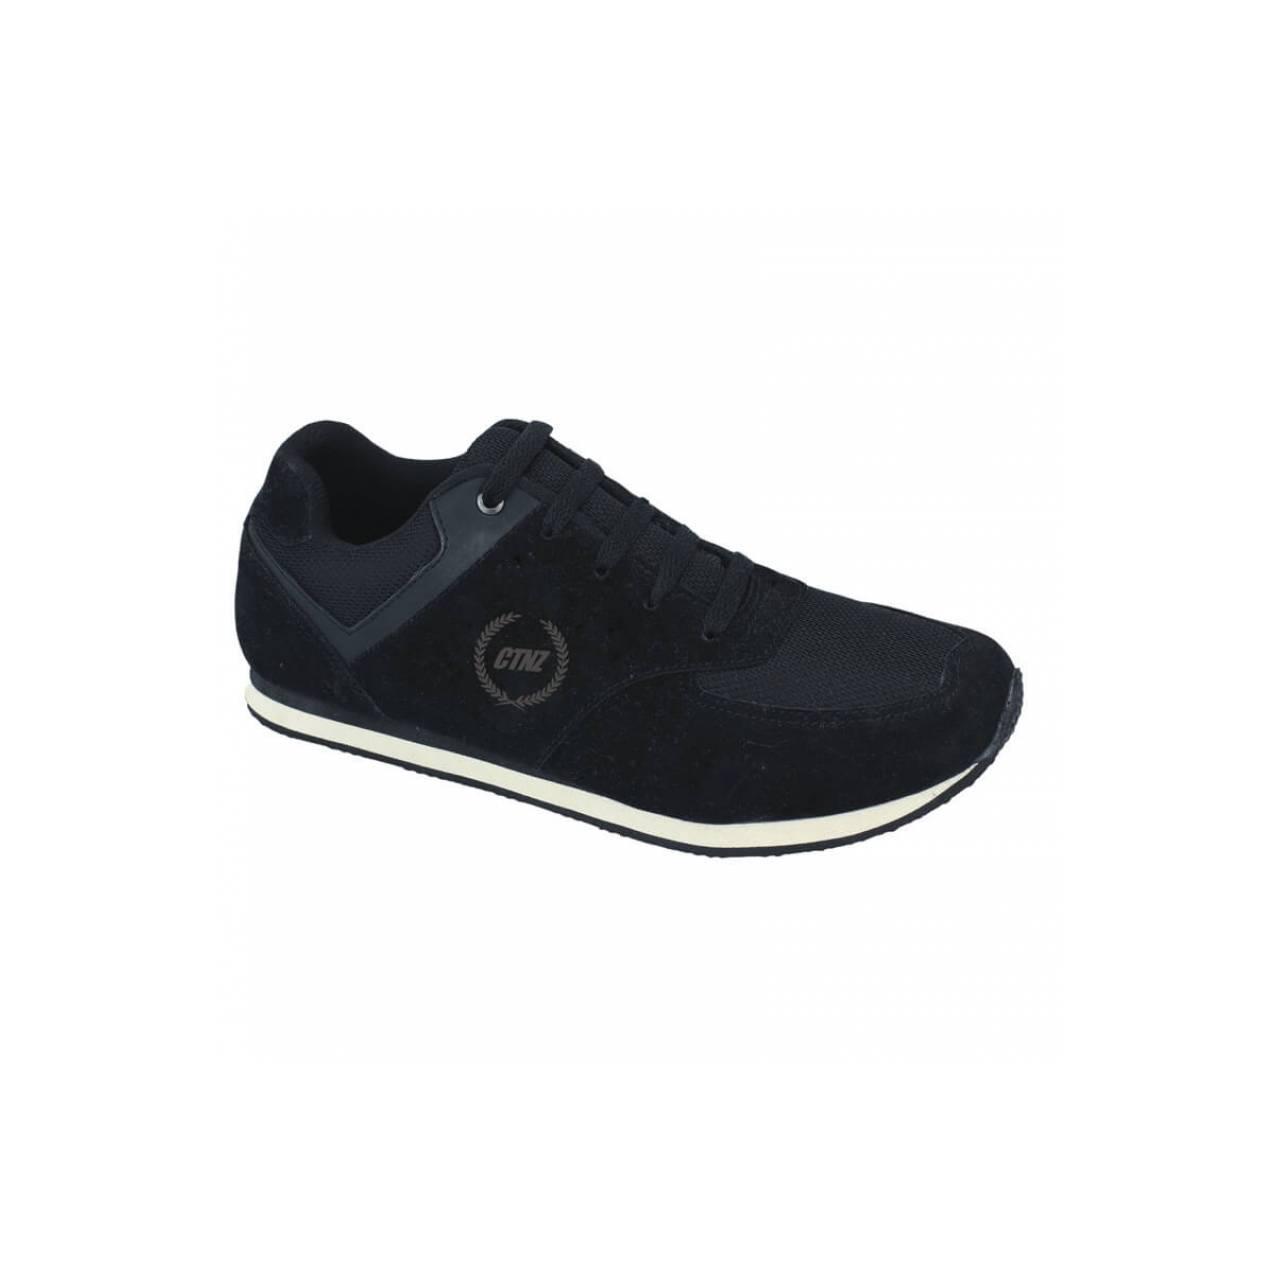 Catenzo Running Shoes Synthetic Sponge Outsole 292 Ir 043 Daftar Dksh New Edition Sendal Casual Kulit Pria Dknz 129 Sepatu Sport Wanita Da 030